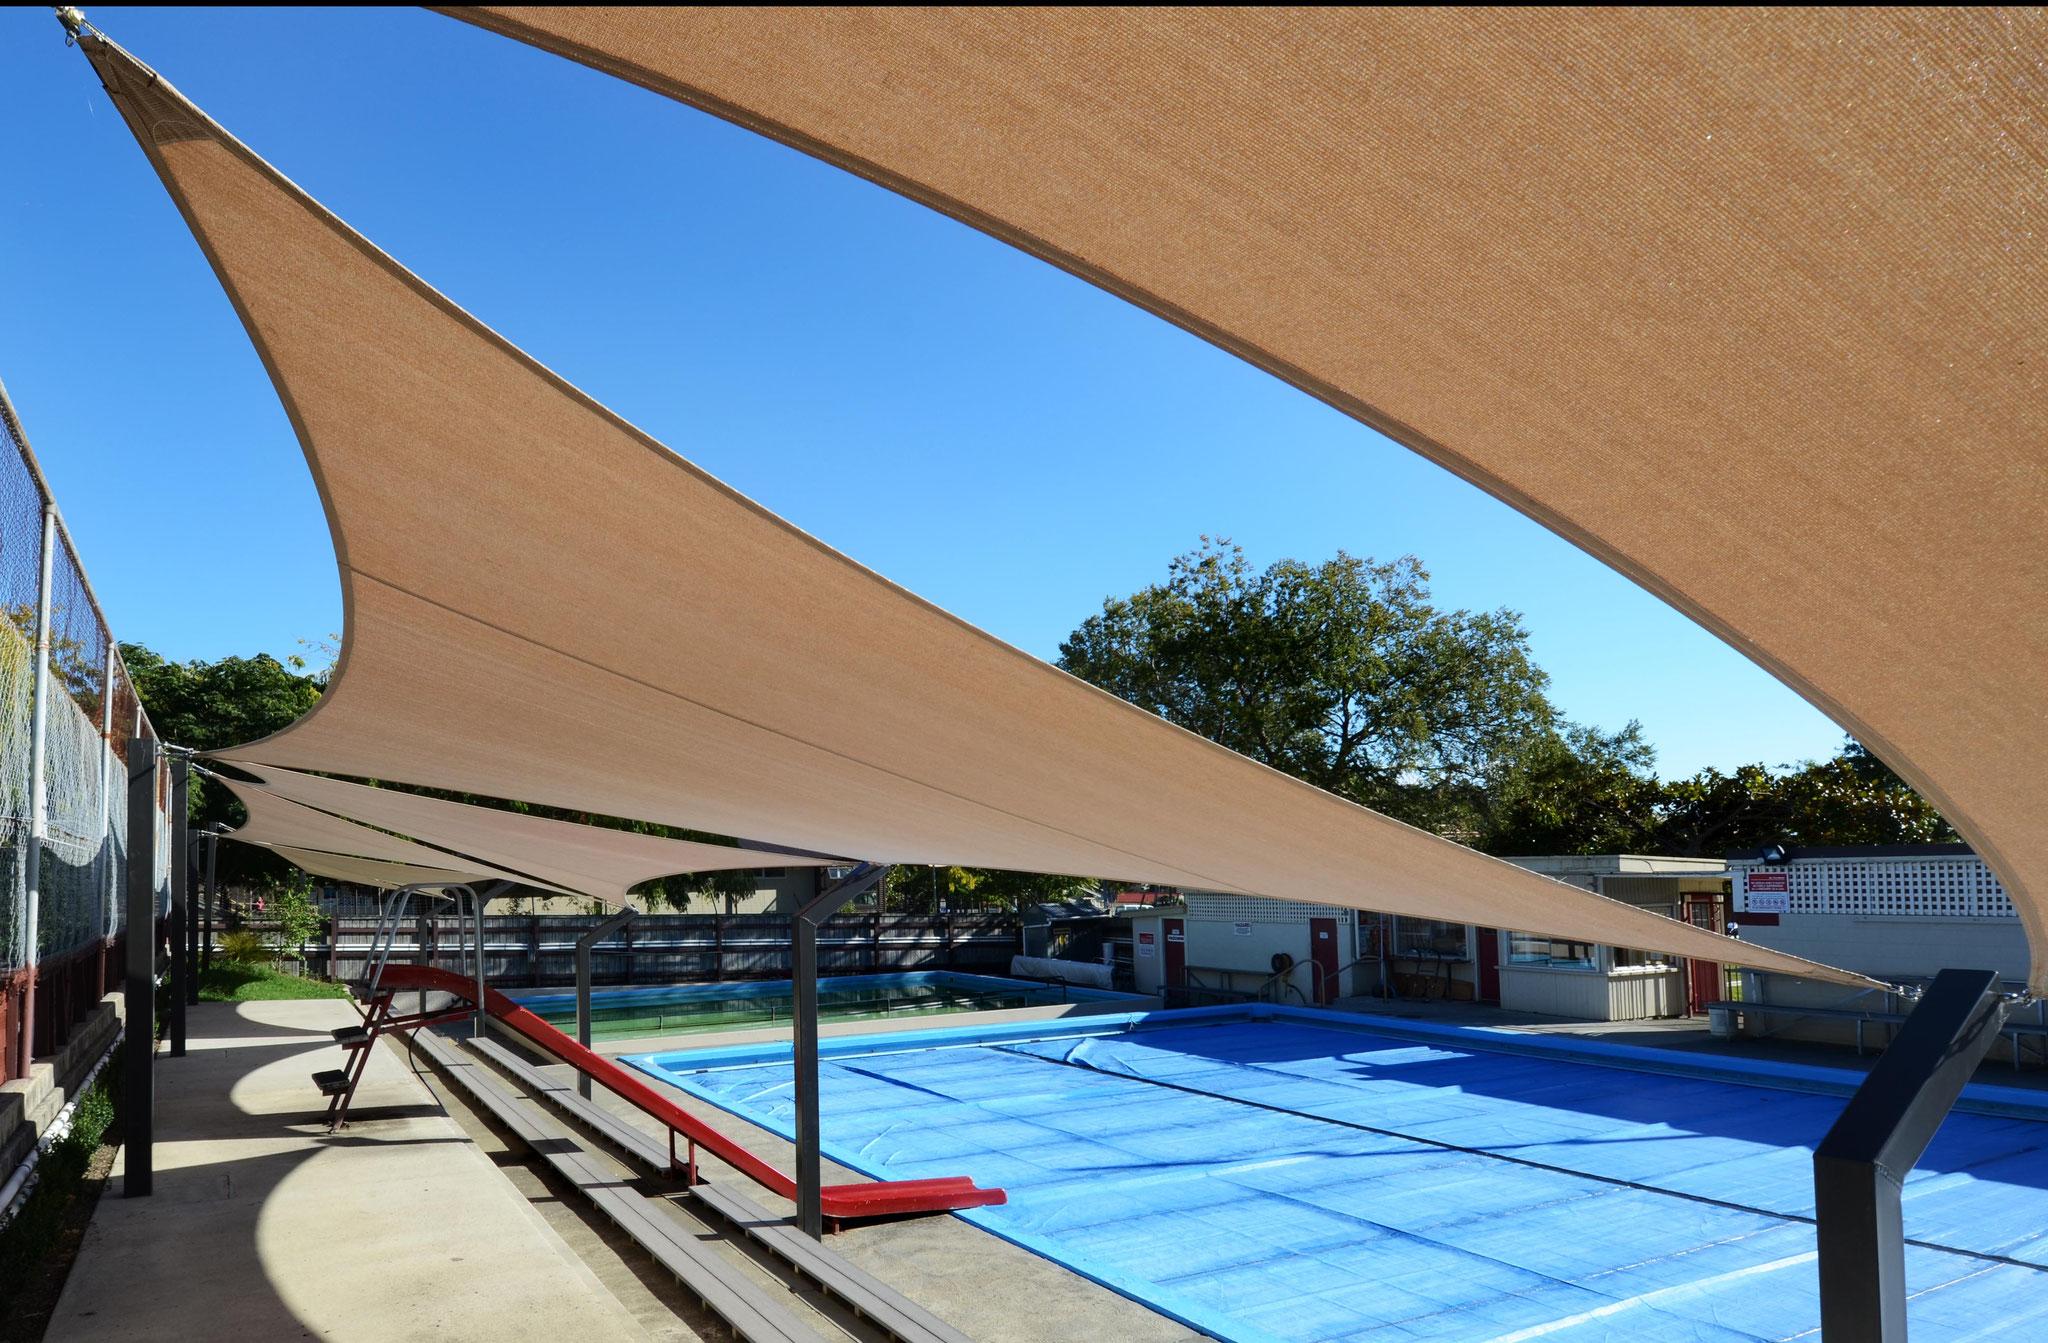 Hampton Street School Pool Shade